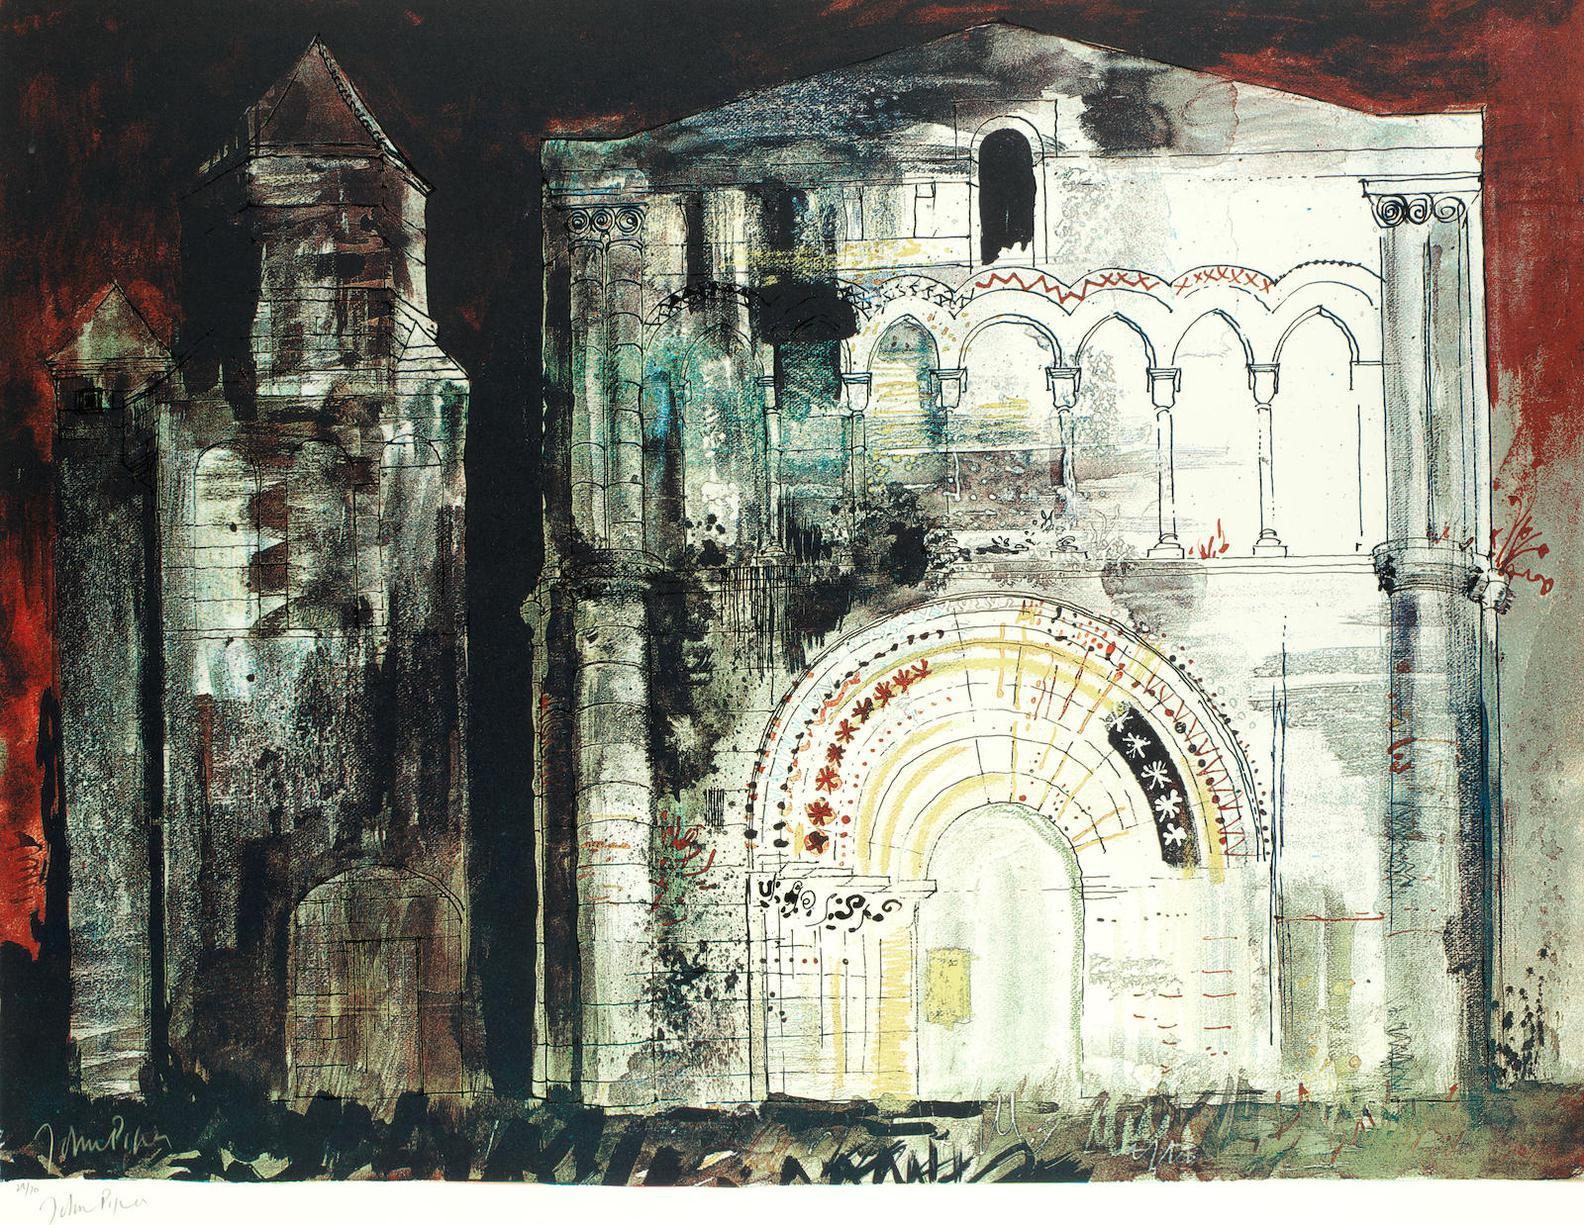 John Piper-St Simon-De-Pelouaille, Charente-1968